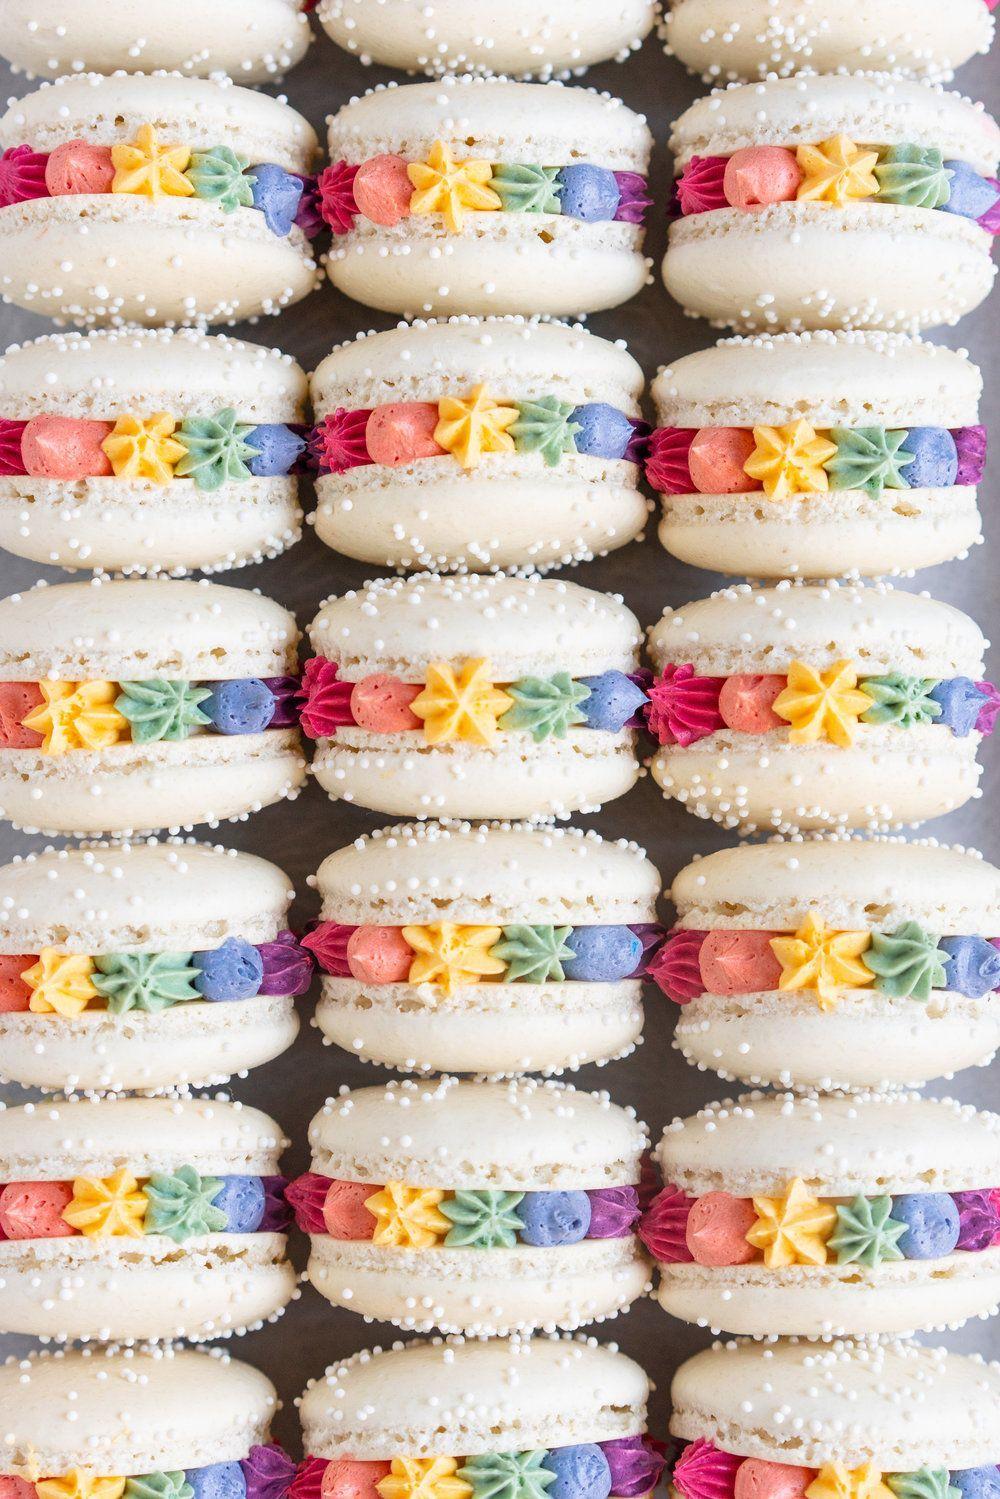 Photo of Rainbow Macarons (Vanilla Bean Macarons with Vanilla Bean Swiss Meringue Buttercream) — Cloudy Kitchen